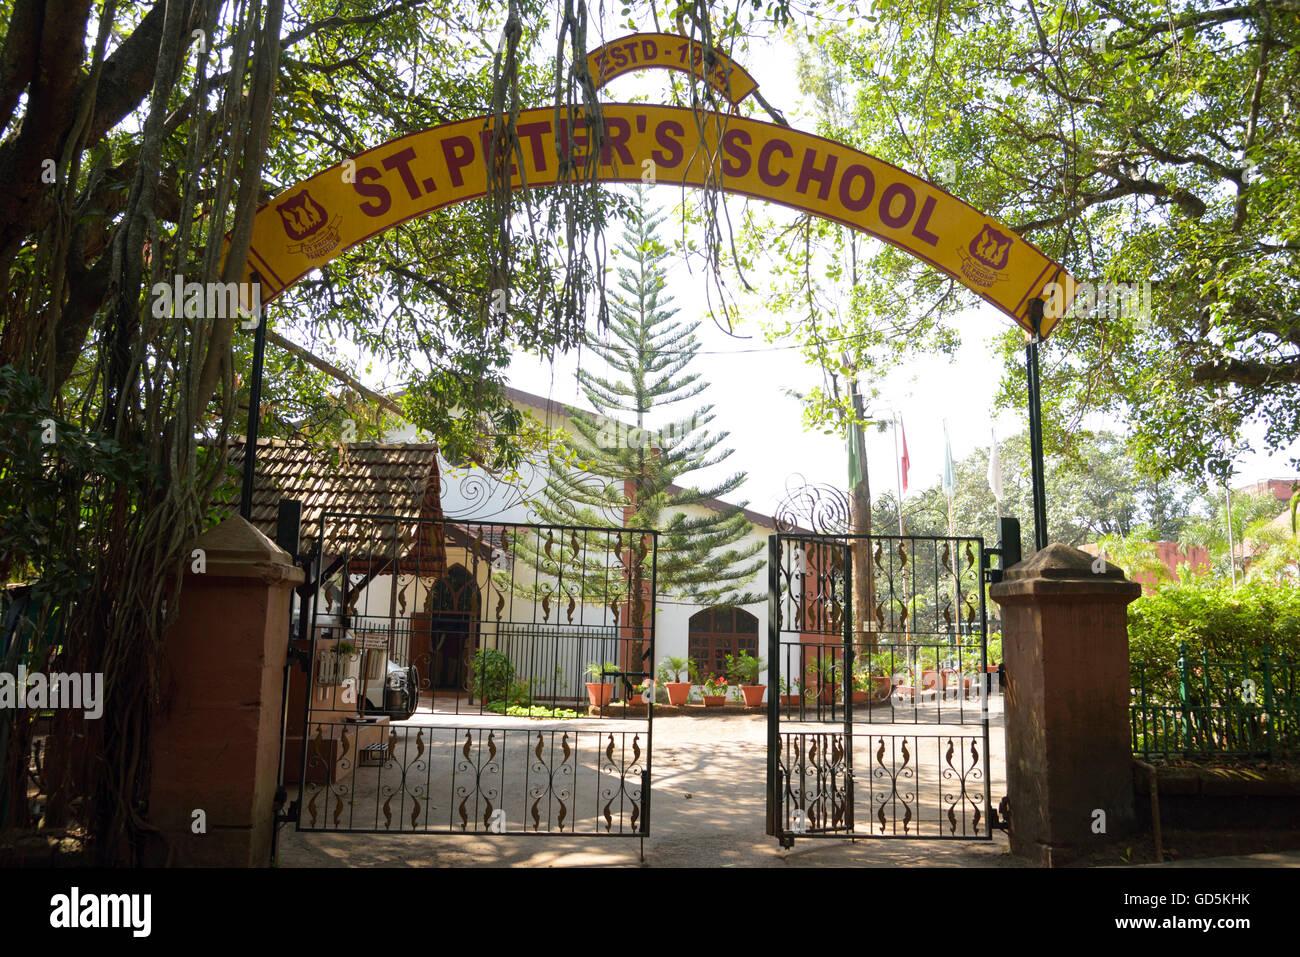 Panchgani photos around panchgani images panchgani temple photos - Sign Board Of St Peter School Panchgani Satara Maharashtra India Asia